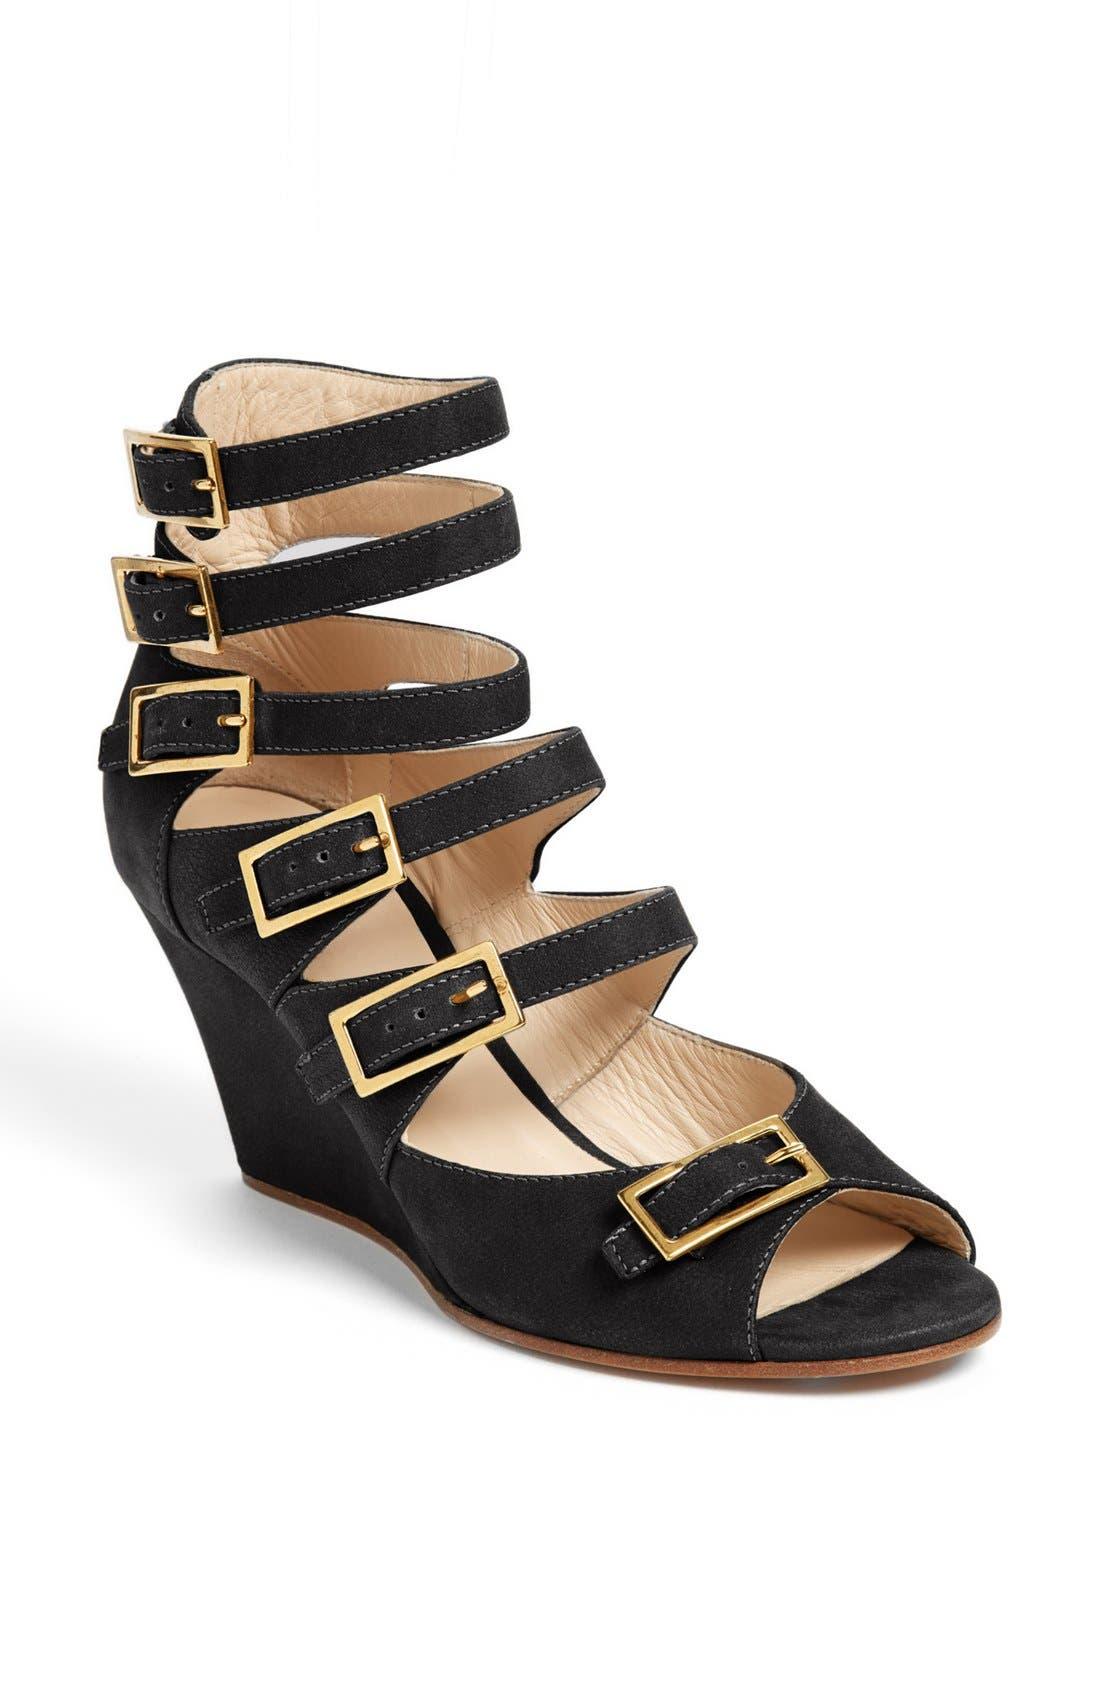 Alternate Image 1 Selected - Chloé 'Arce' Multi Strap Wedge Sandal